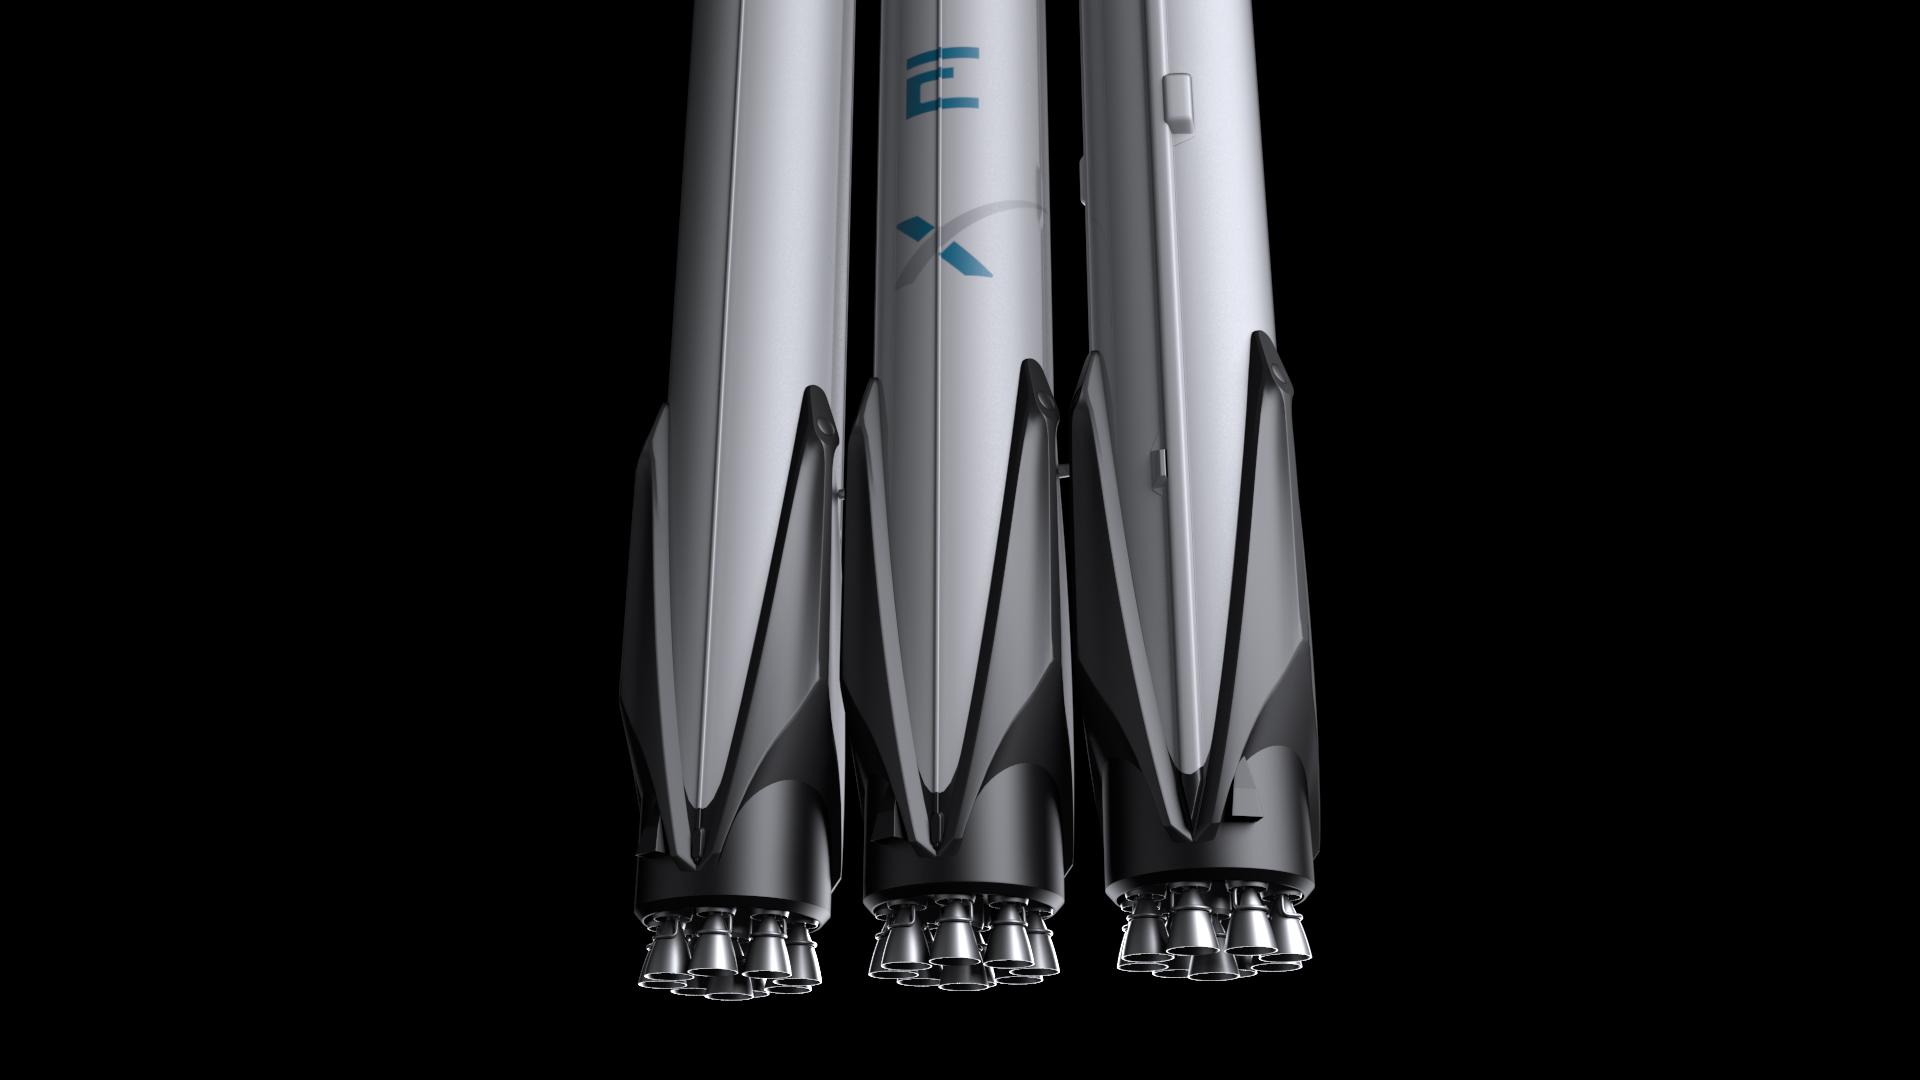 falcon heavy v1.2 3d model max fbx c4d lwo ma mb hrc xsi obj 277816